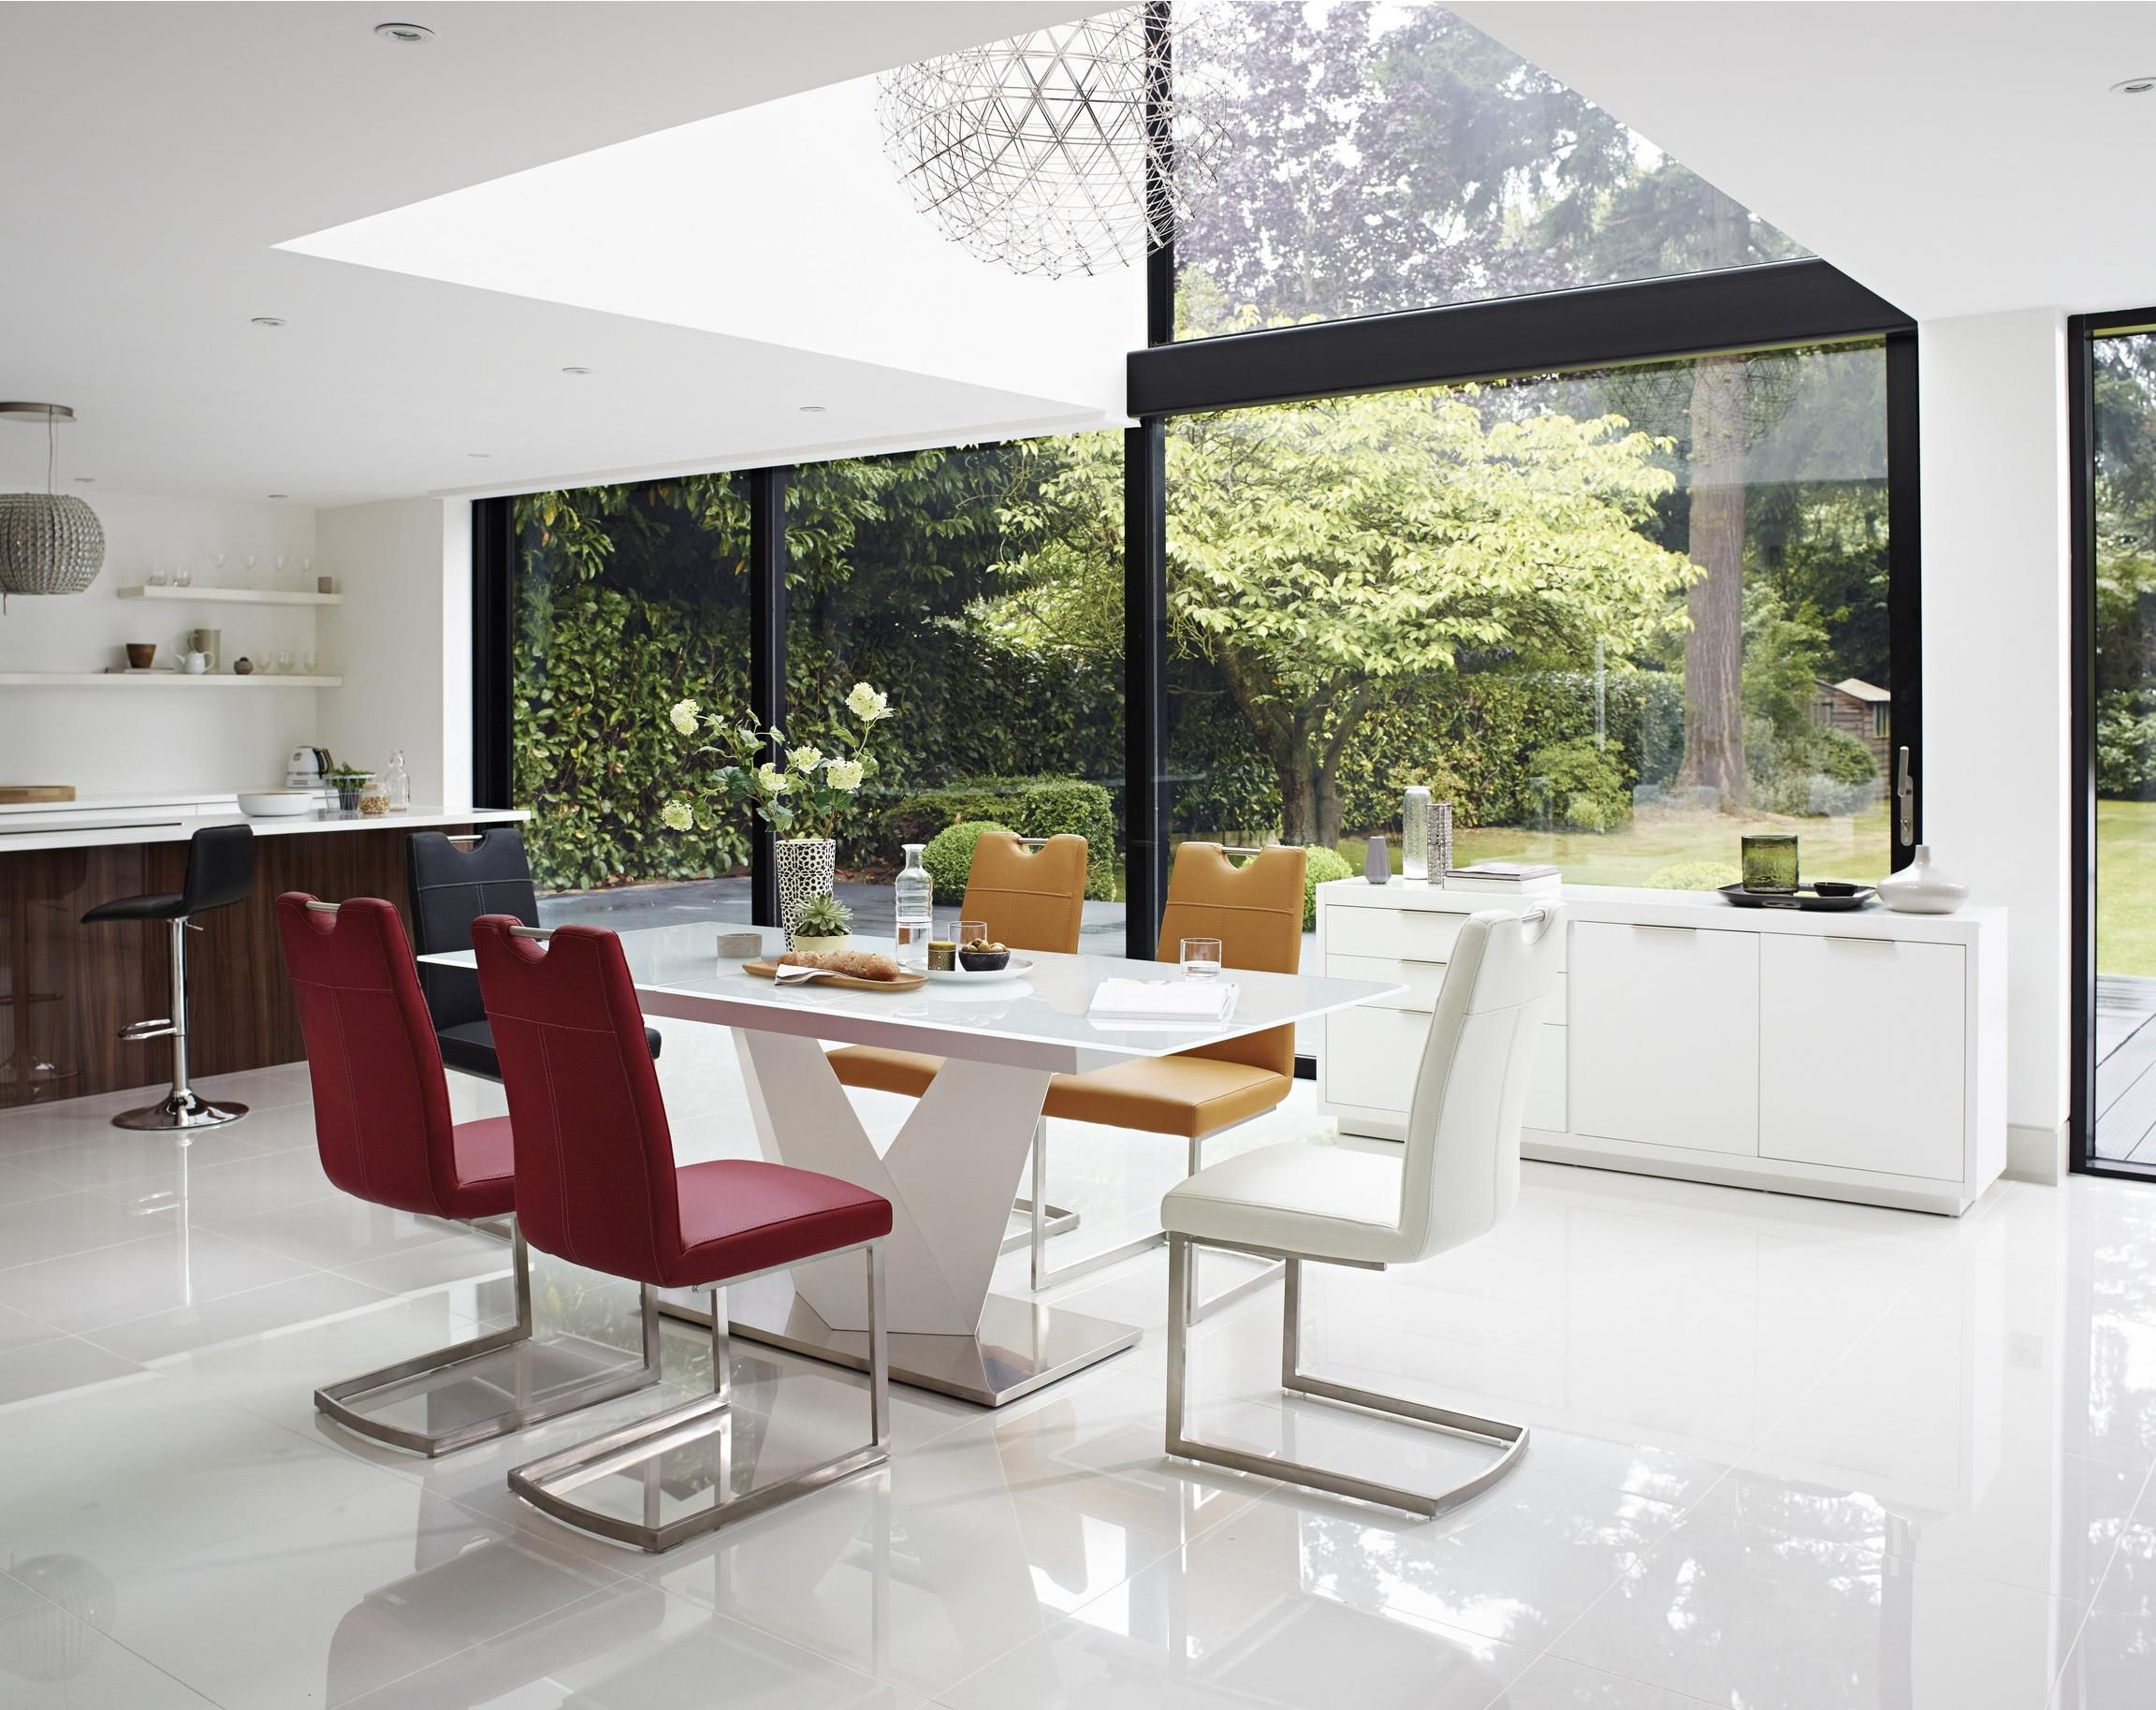 tables rega viewing photo harvey coffee norman of gallery thetempleapp store furniture harveys photos